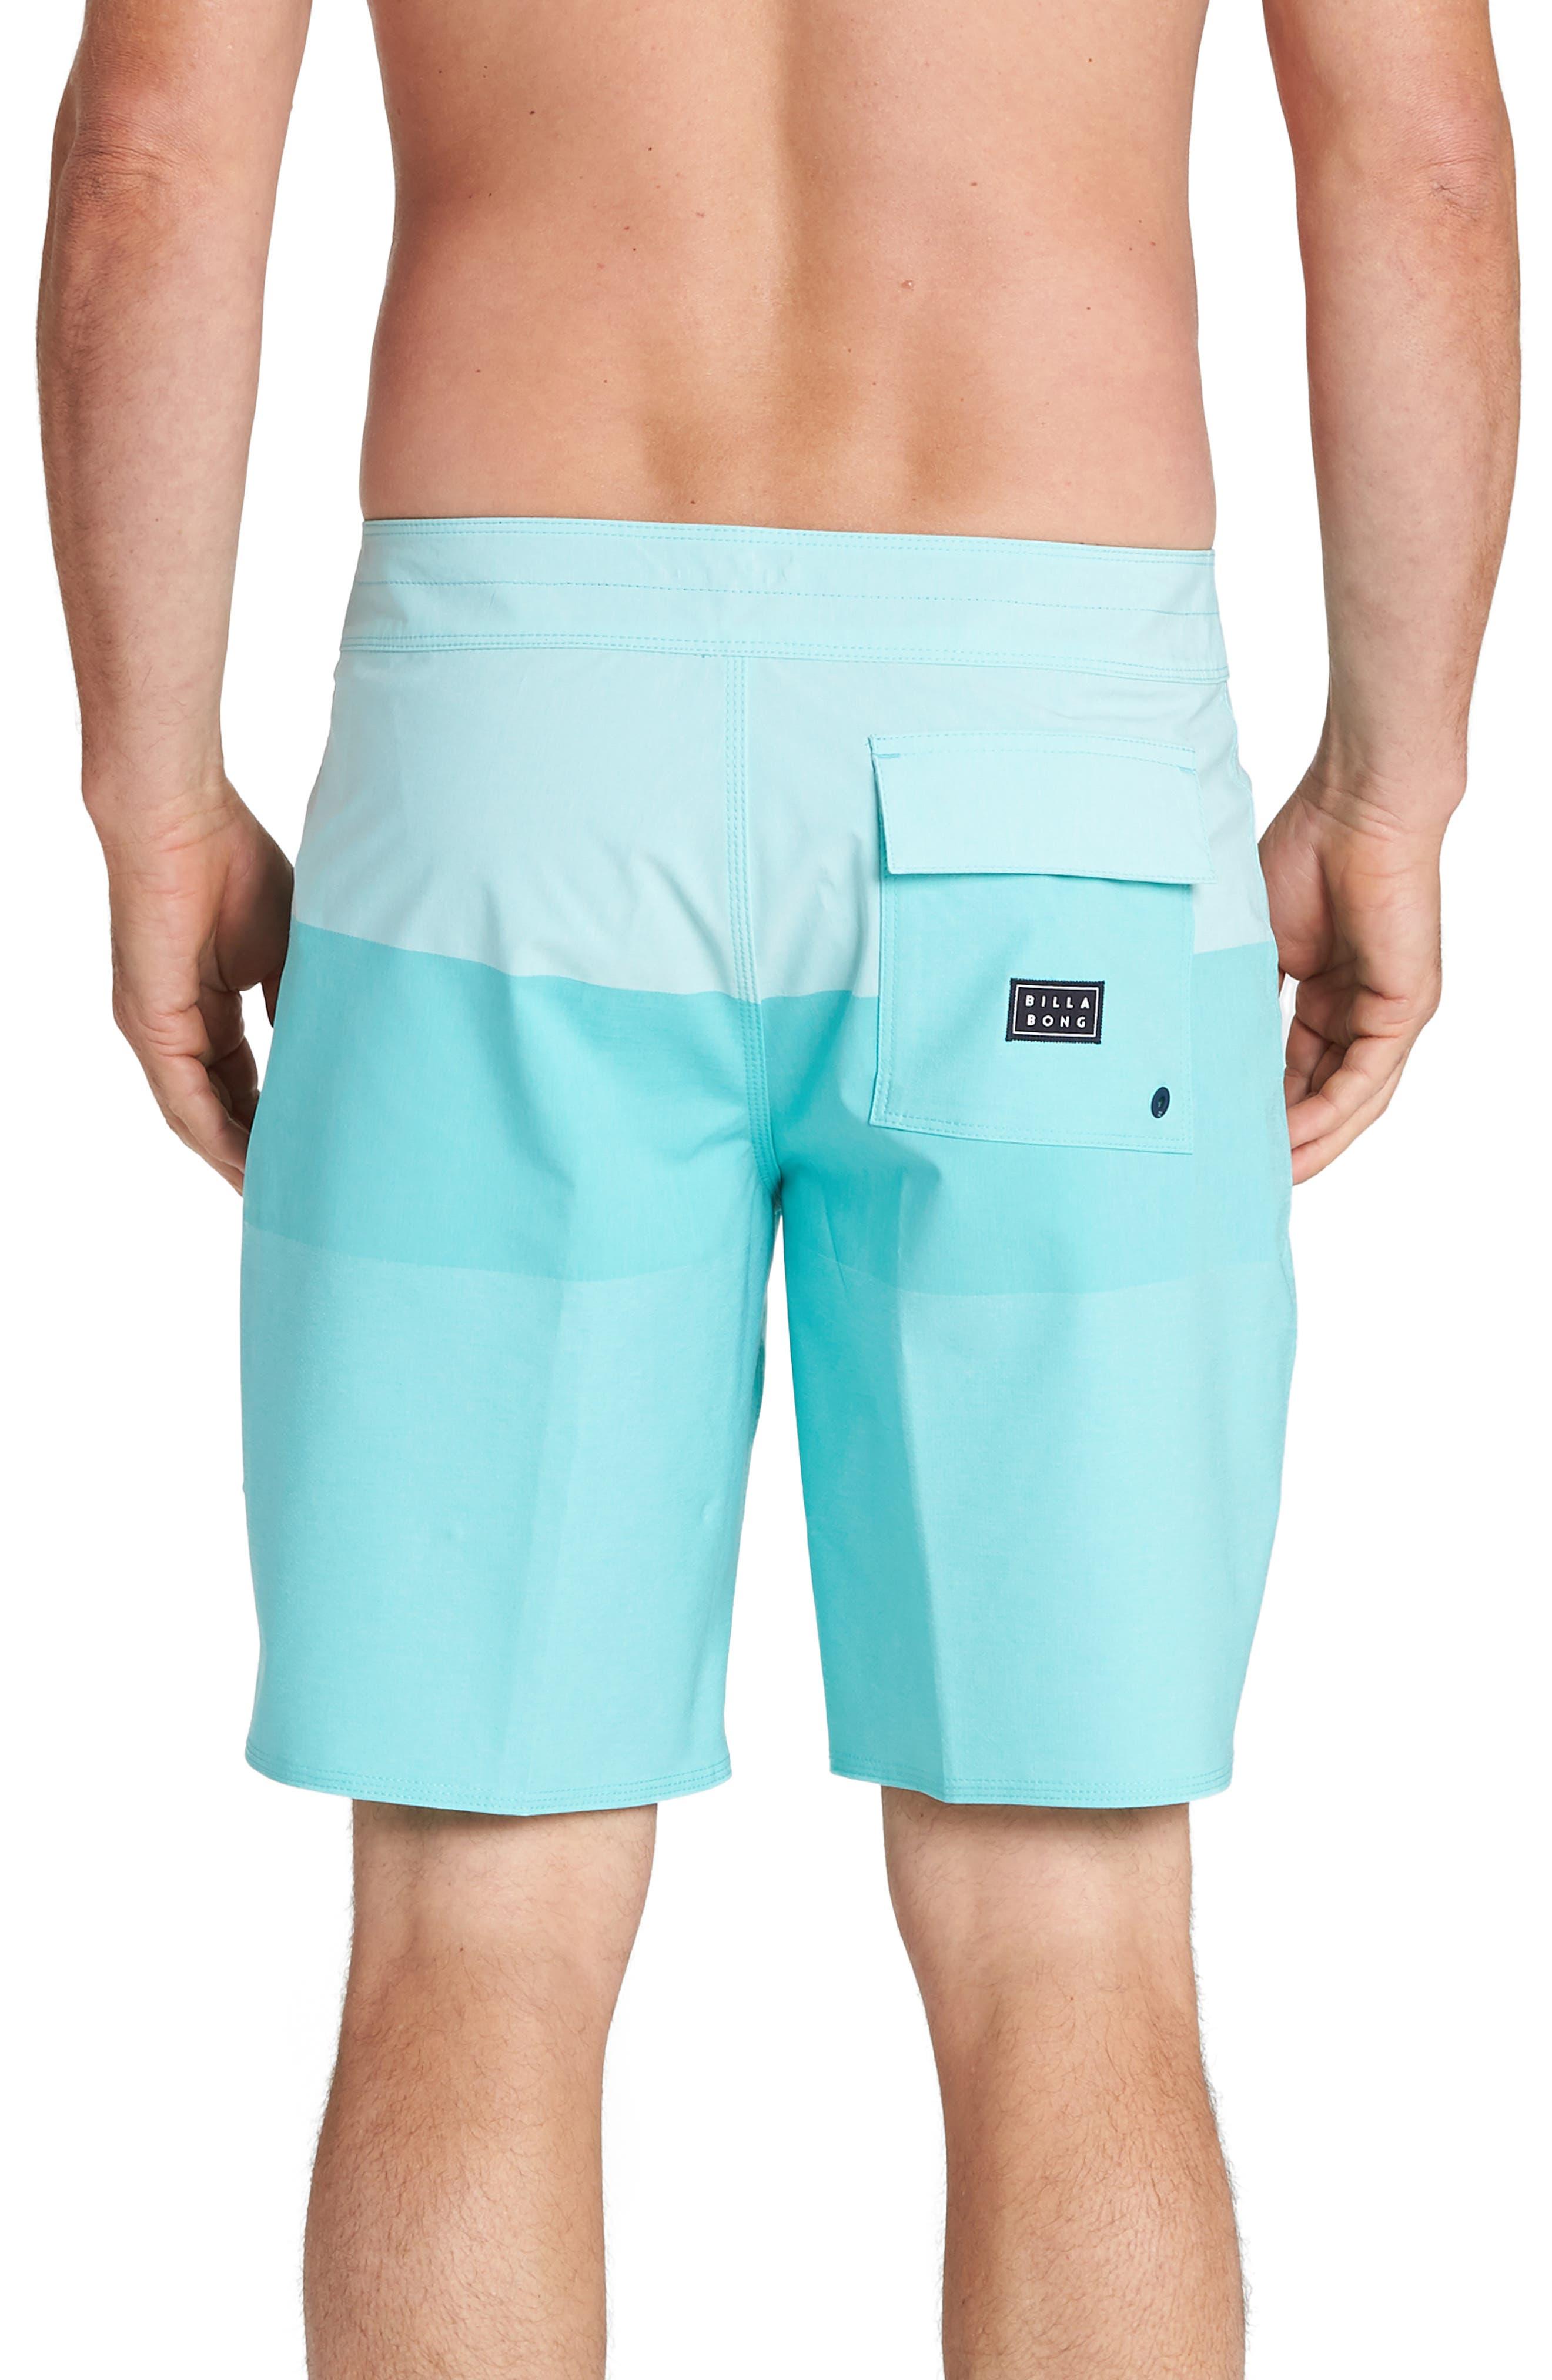 60600ea84b4 Green Billabong Board Shorts & Clothing for Men | Nordstrom